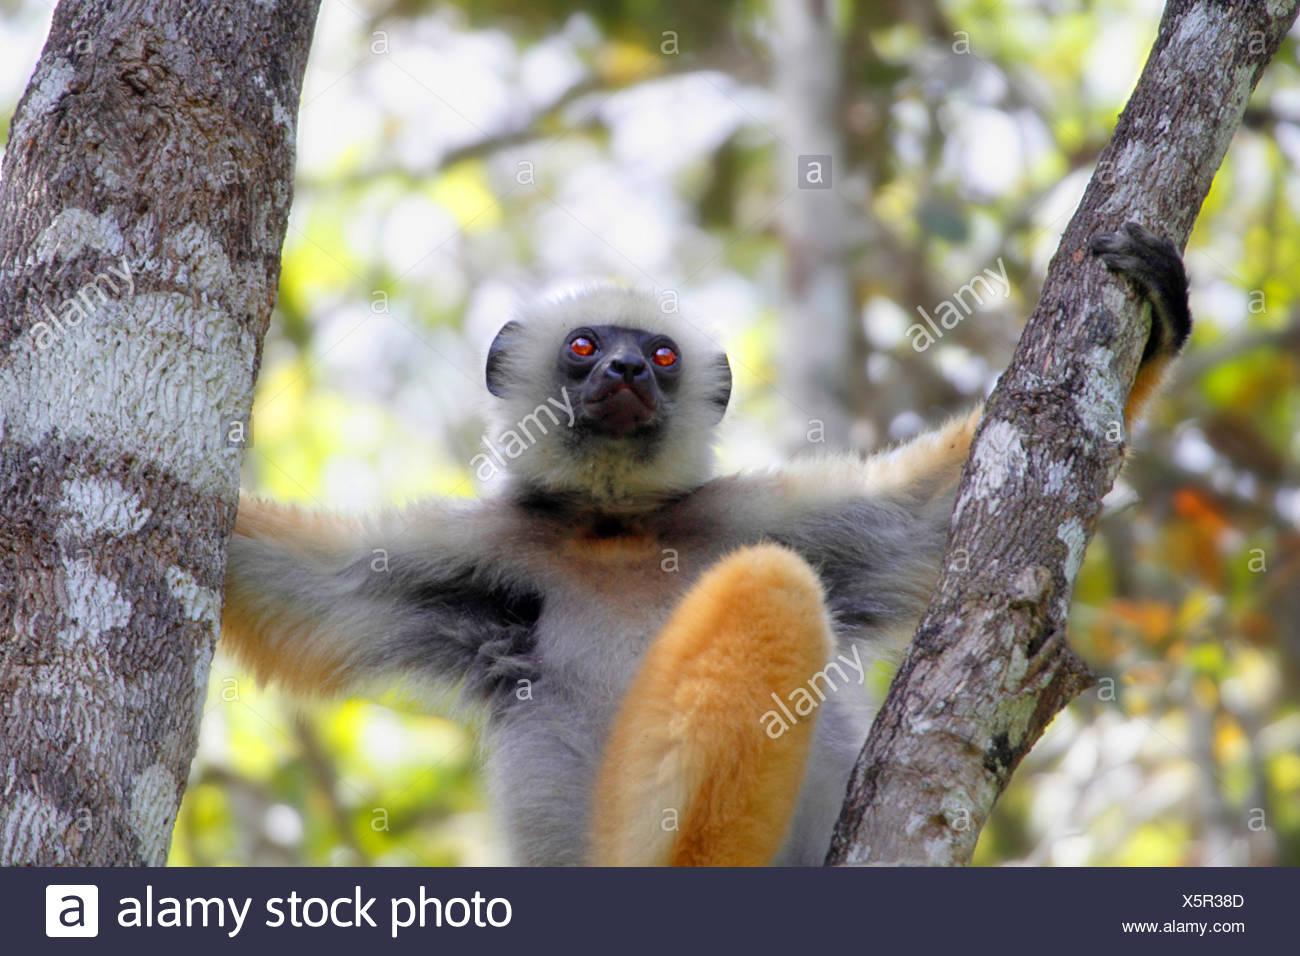 diadem sifaka, diademed sifaka (Propithecus diadema), is sitting on a fork of a branch, Madagascar, Analamazaotra National Park - Stock Image